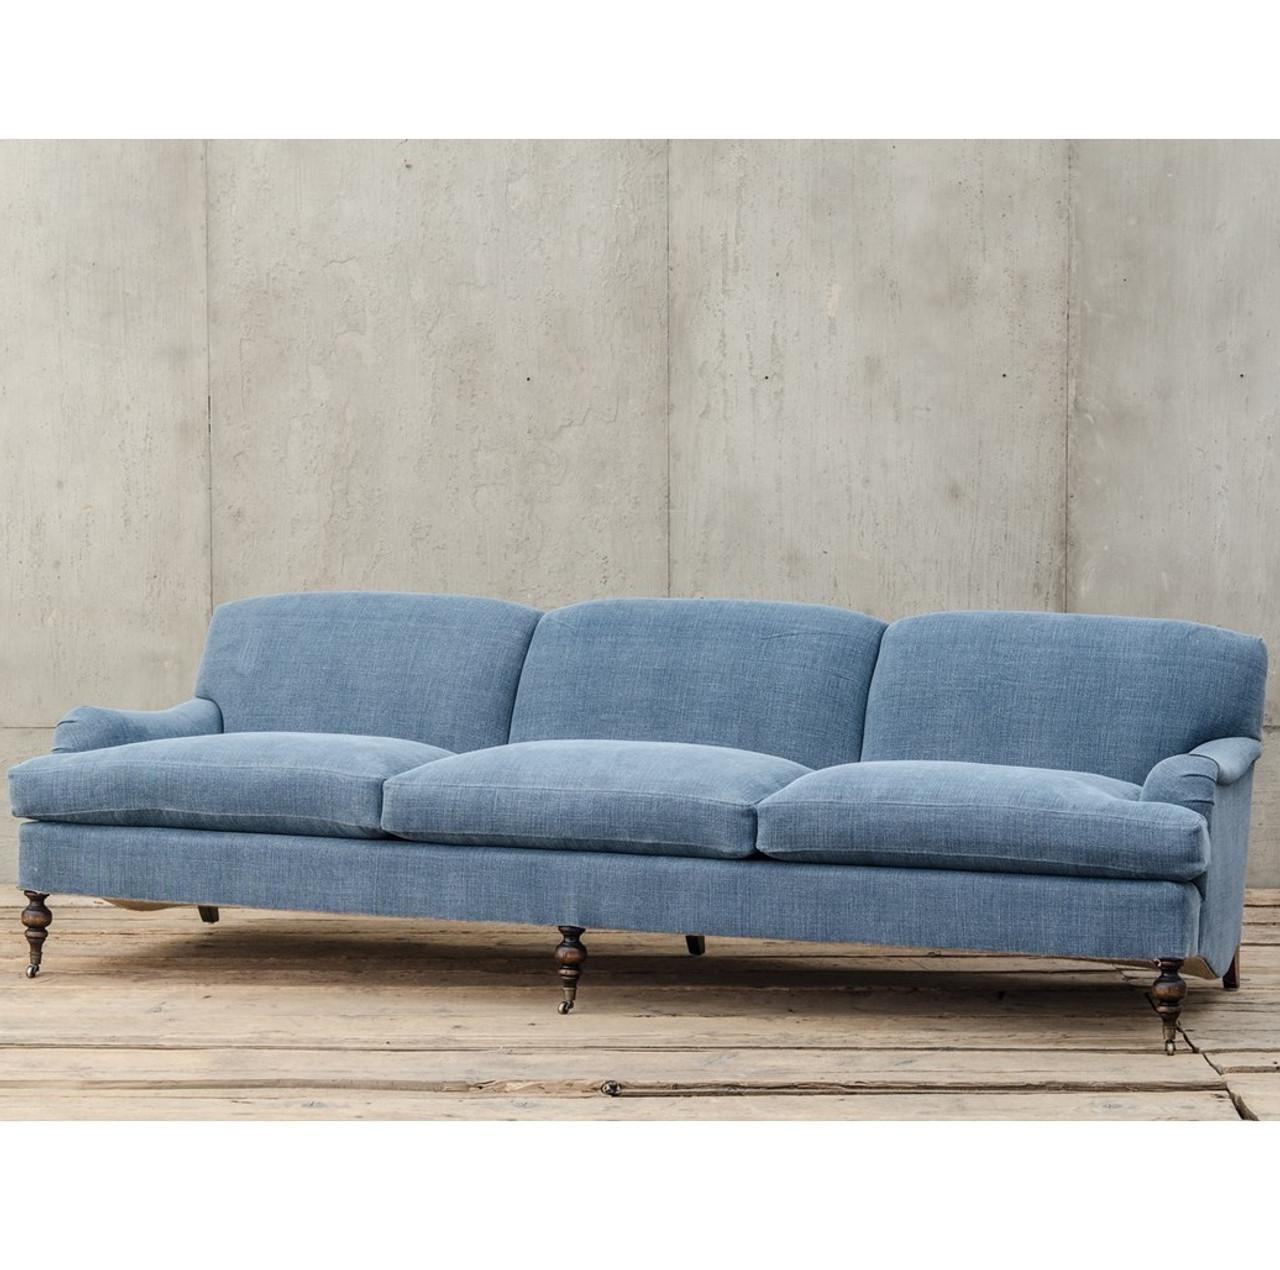 Professor Plum's Blue Linen Upholstered English Roll Arm